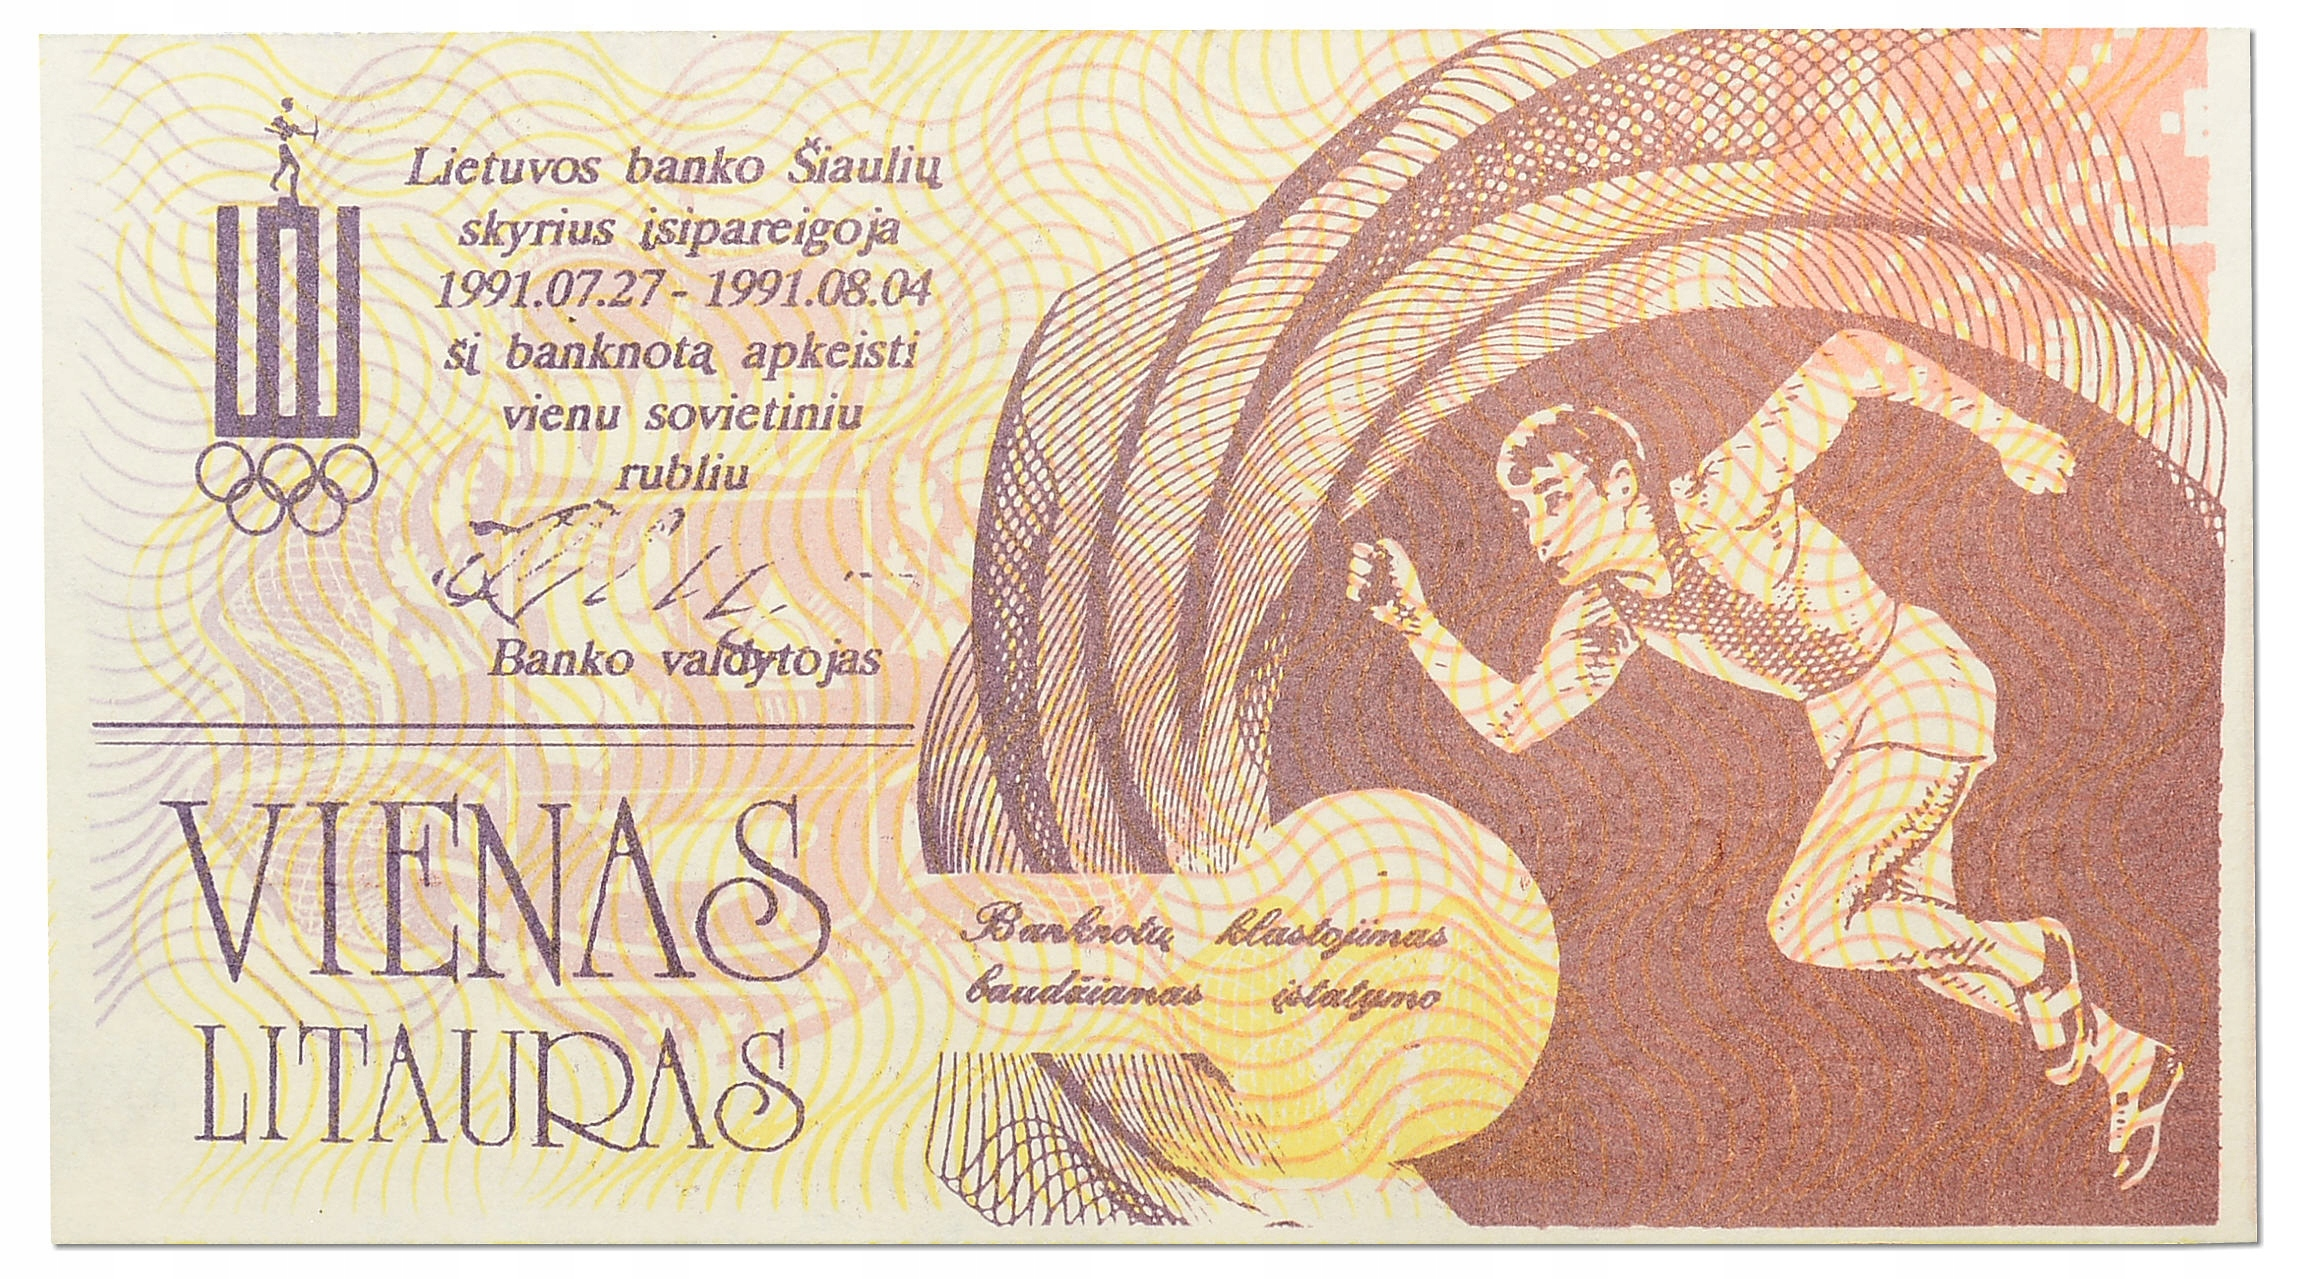 2.Litwa, Szawle, 1 Litauras 1991 LTOK, St.1